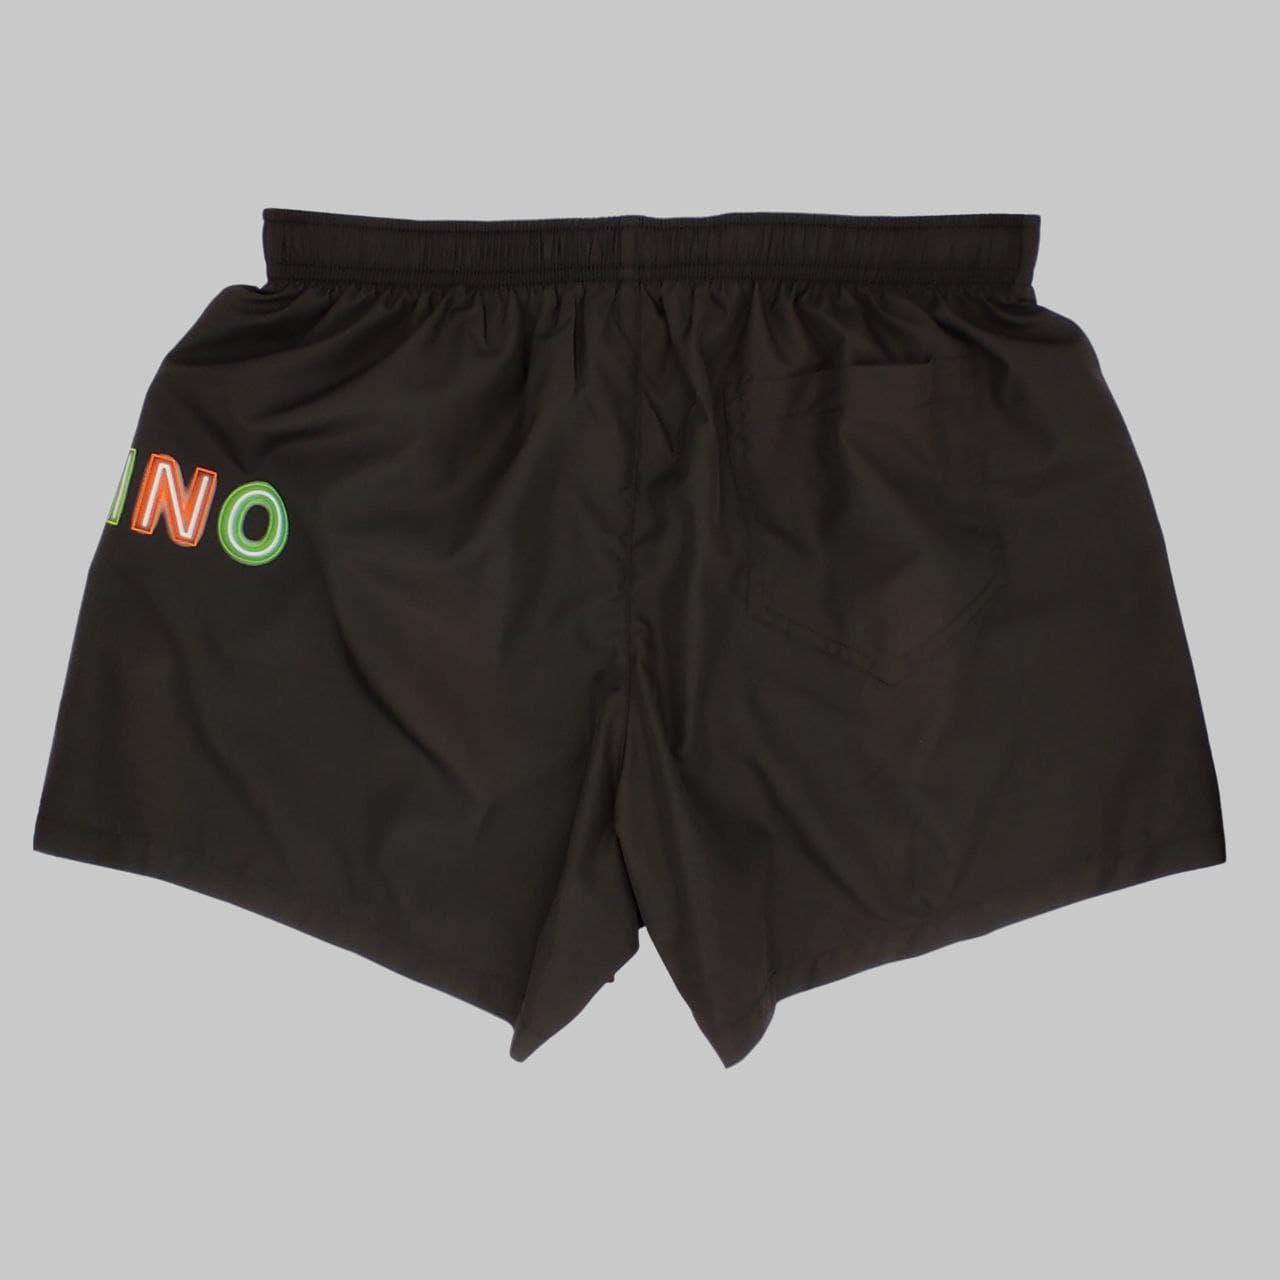 MOSCHINO SWIM | Swimwear | A6154 59890555